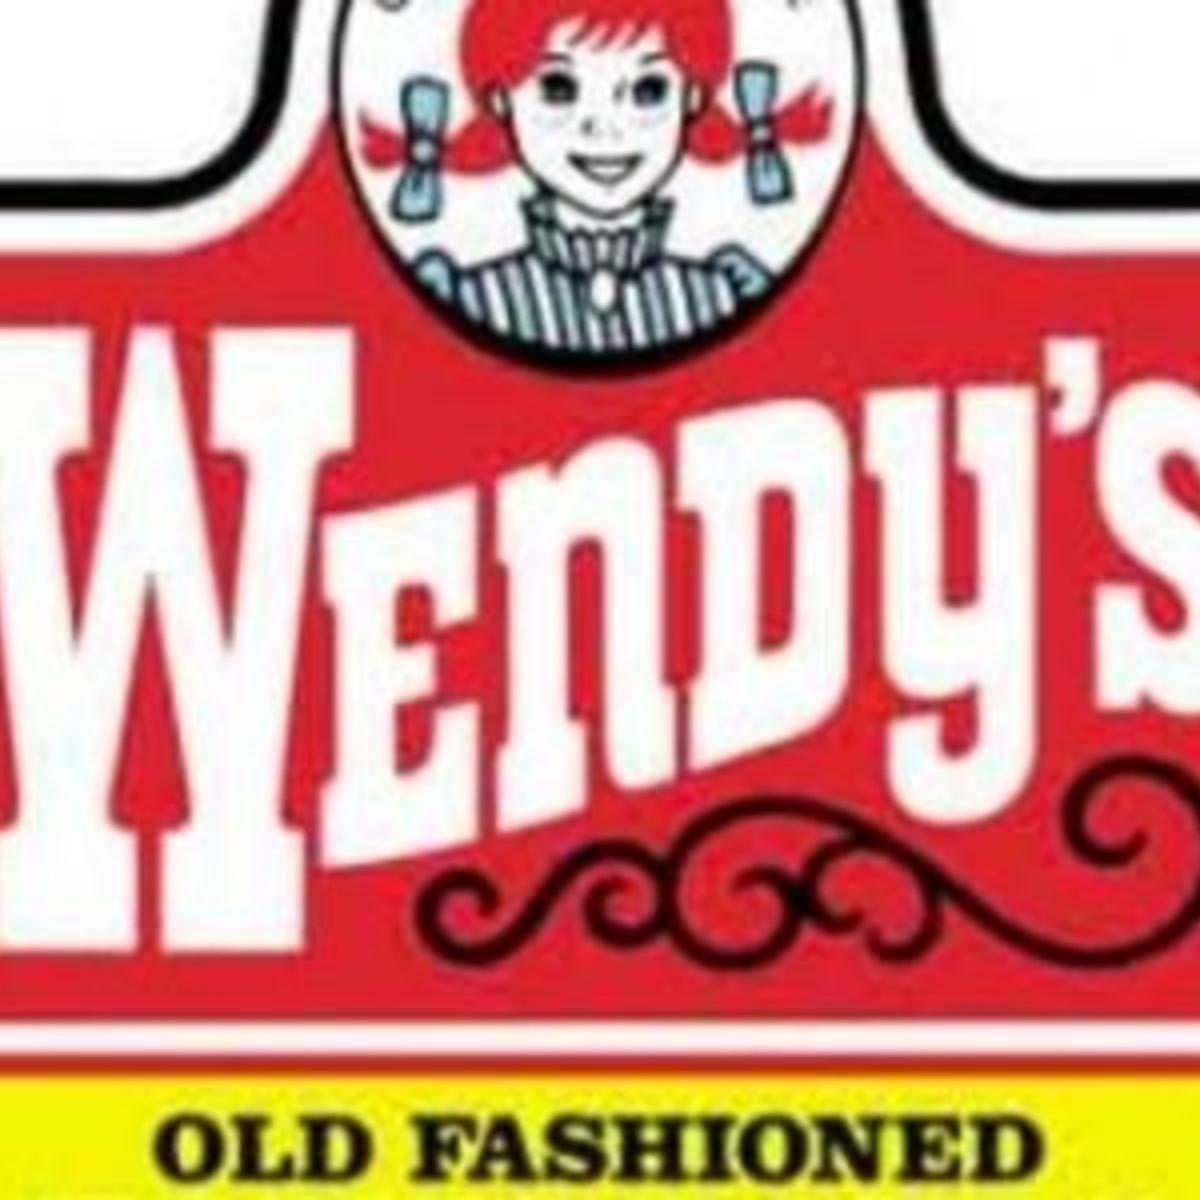 Wendy S Classic Greek Fresh Stuffed Pita Recipe Fast Food Wendys Coupons Smart Points